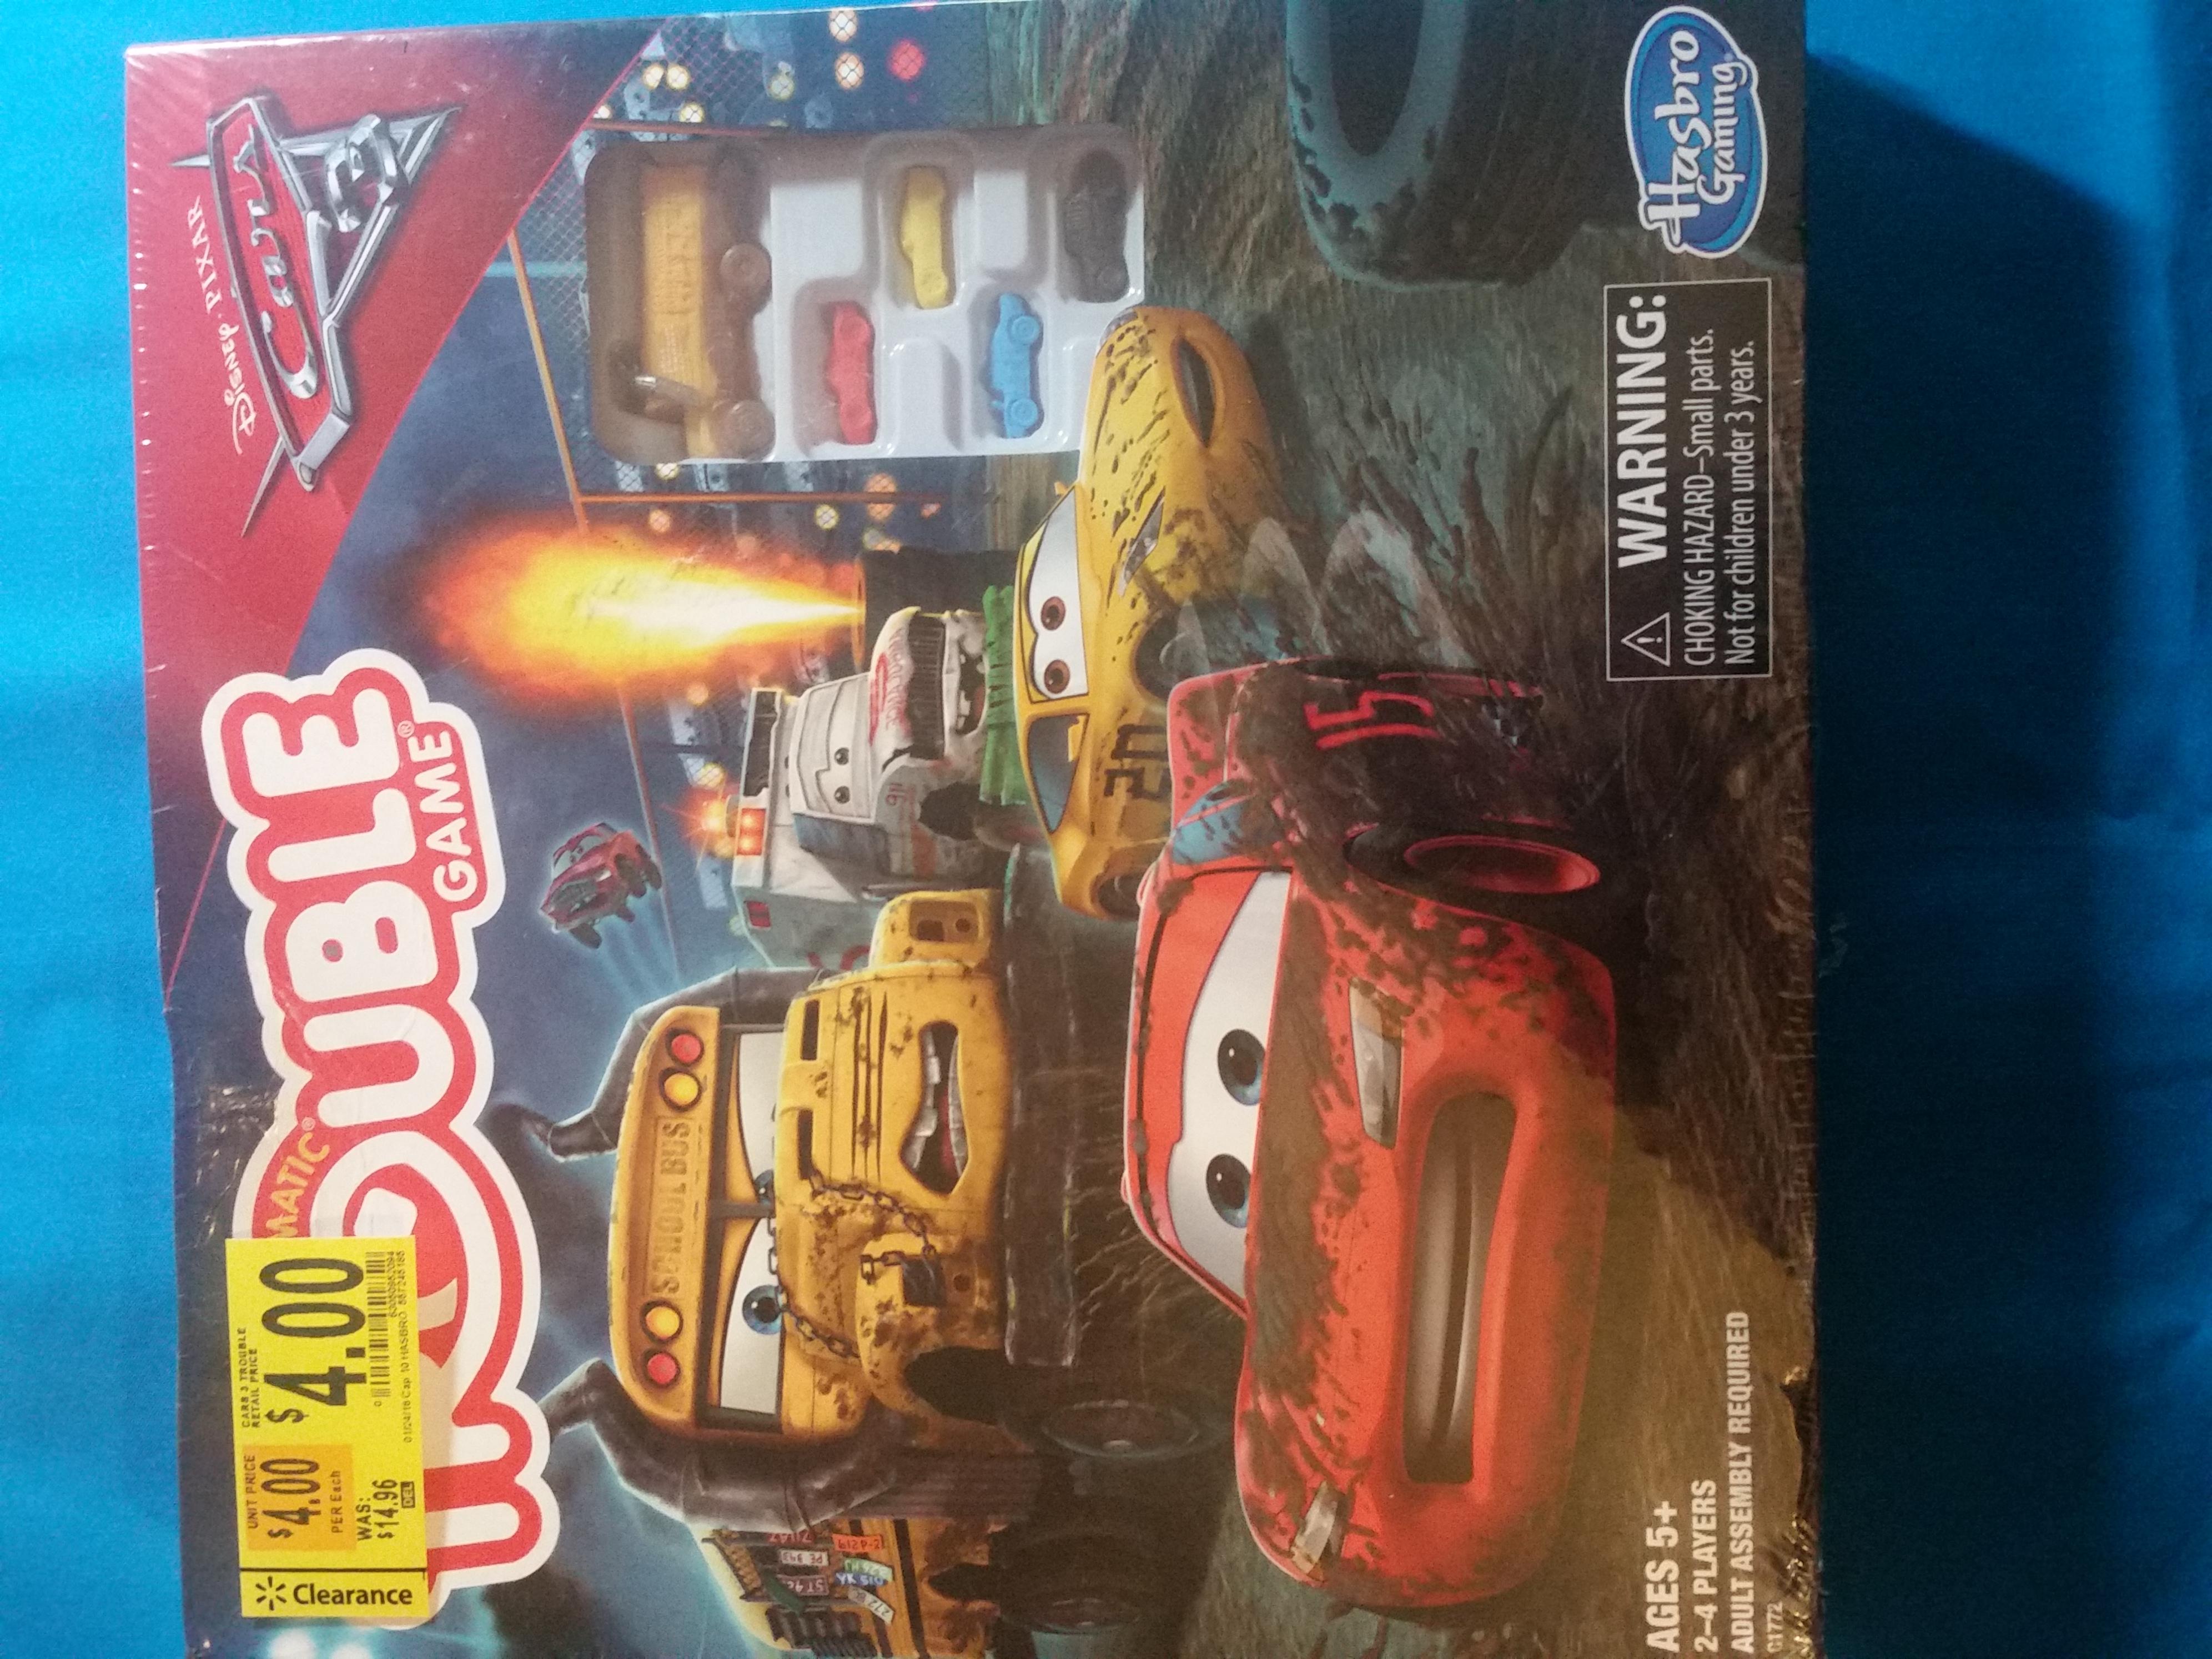 YMMV Walmart Disney Cars Pickem Up Game  2.50 and Disneys Cars Trouble Game 4.00, Doggie Doo Game 3.50